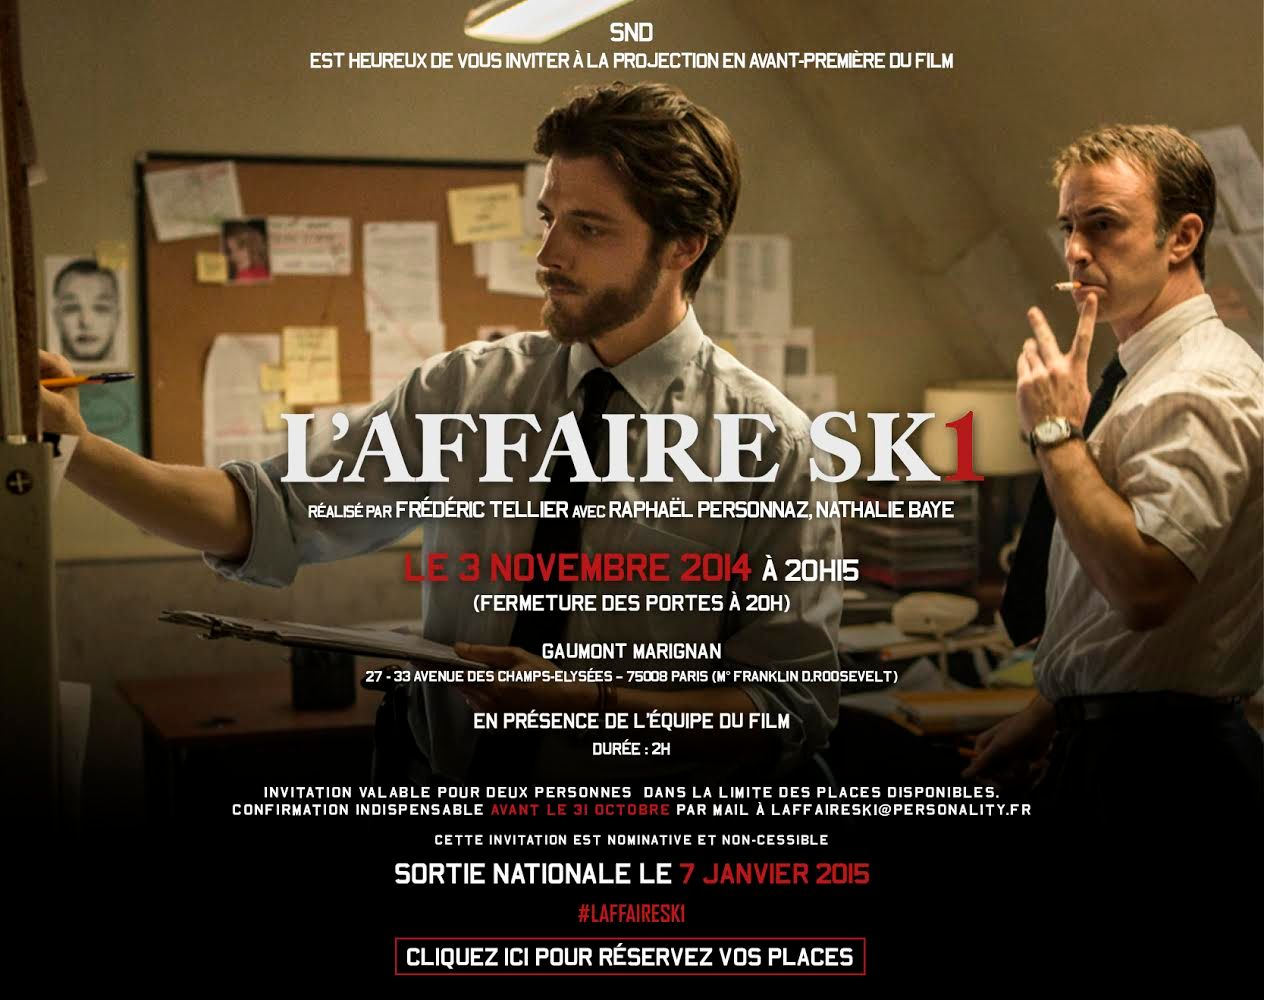 film laffaire sk1